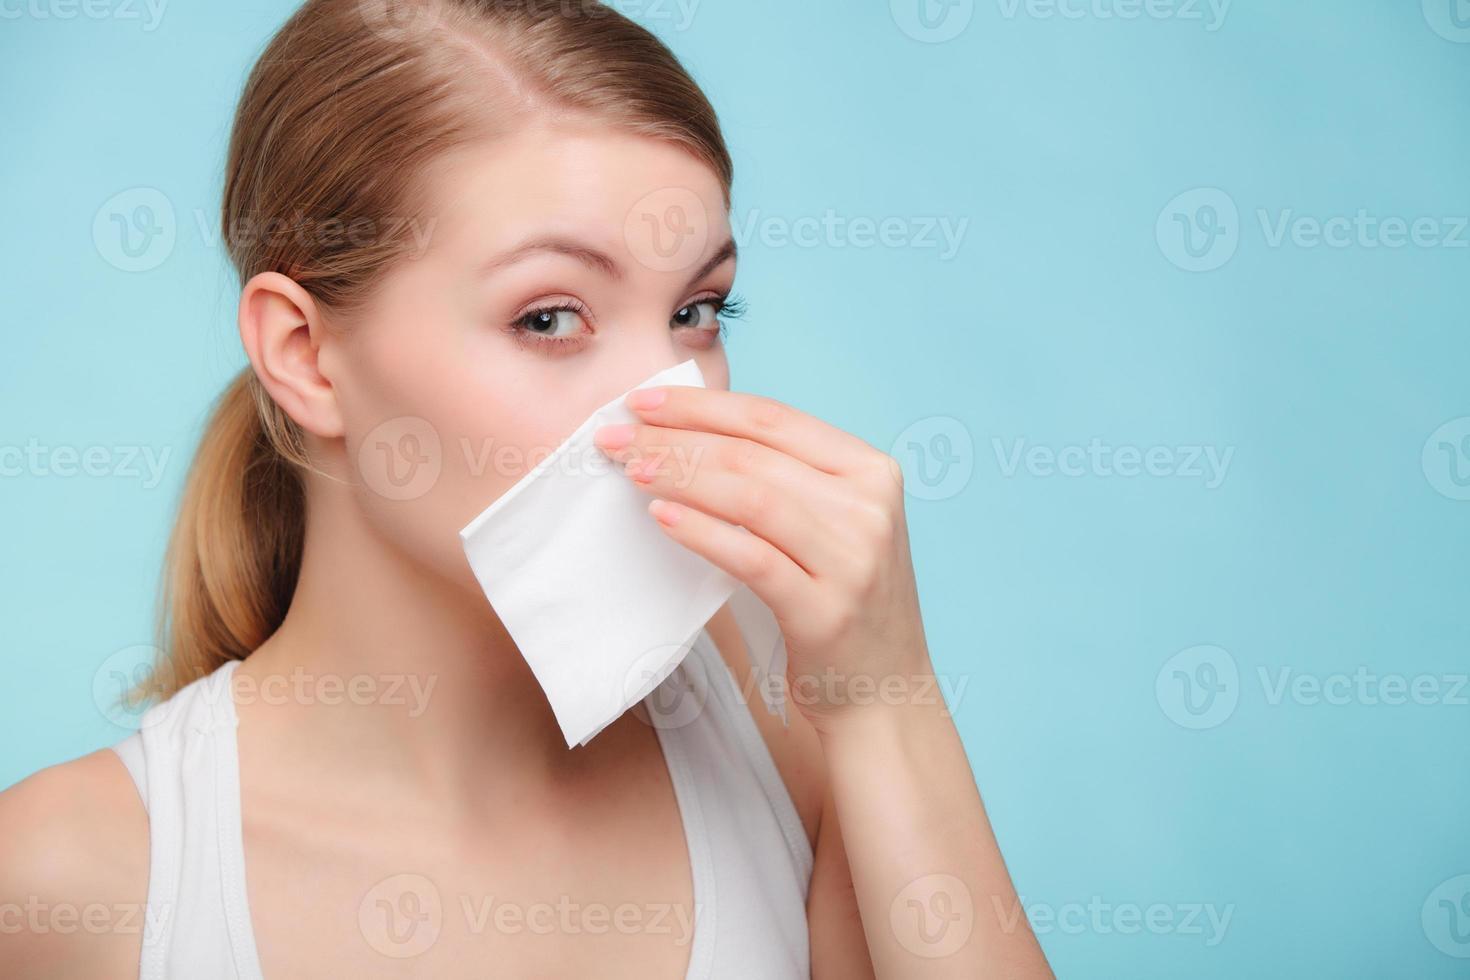 allergia influenzale ragazza malata che starnutisce nei tessuti. Salute foto